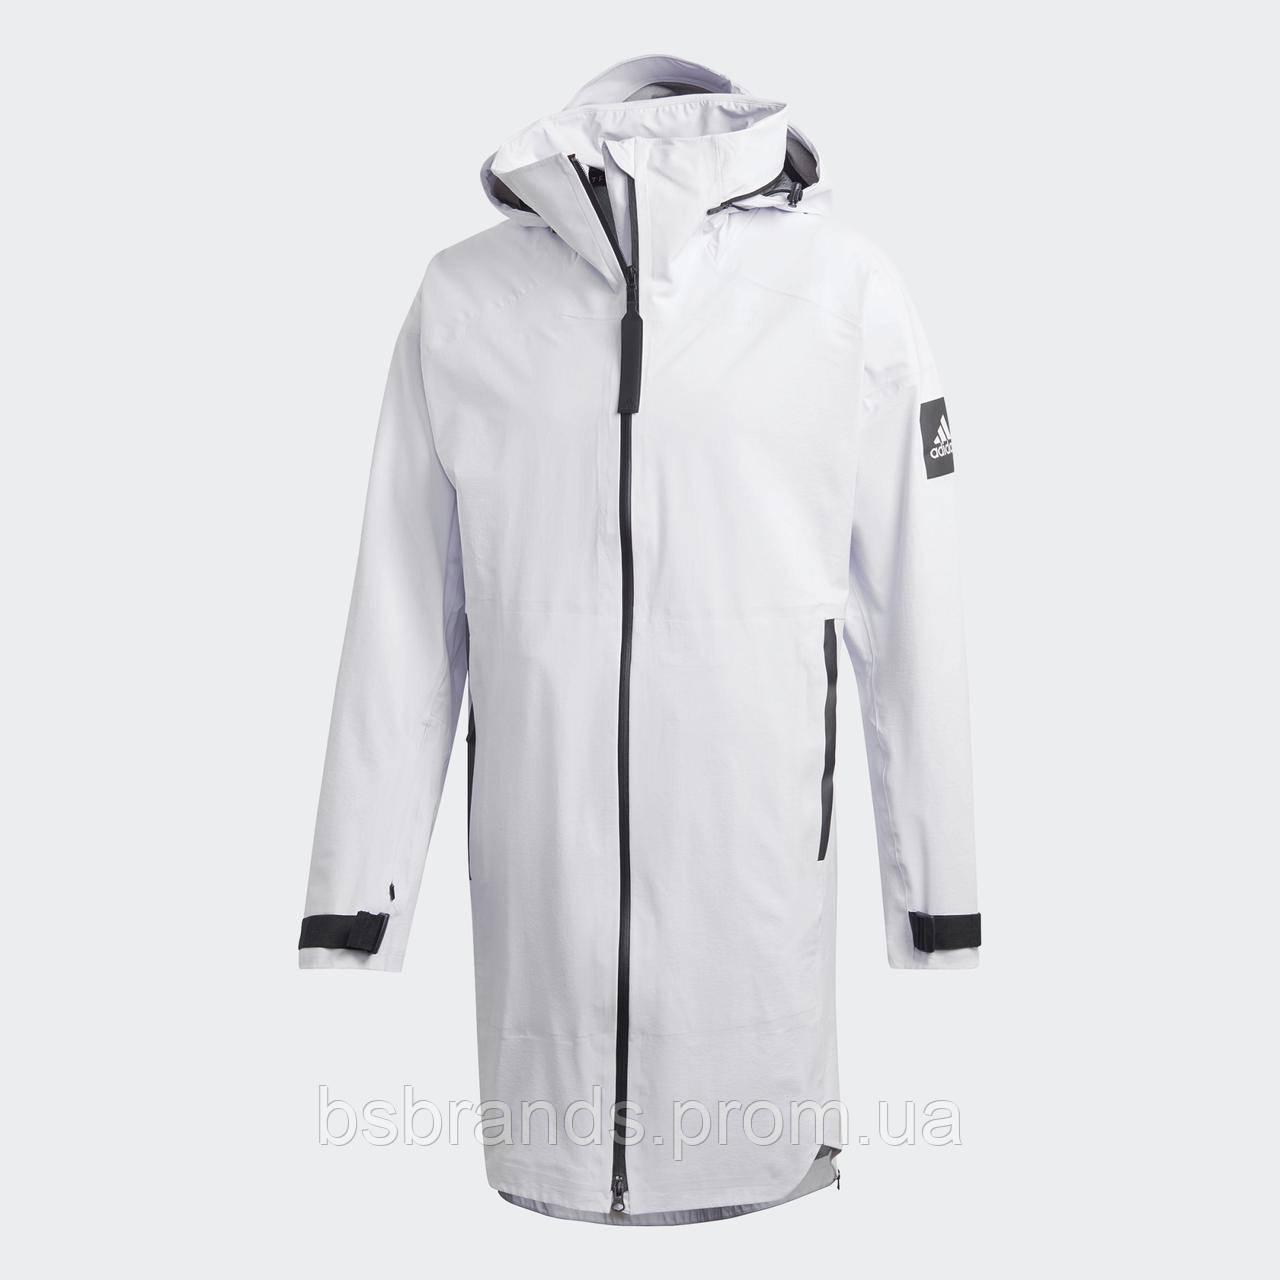 Мужская парка adidas MYSHELTER RAIN.RDY FI0596 (2020/1)